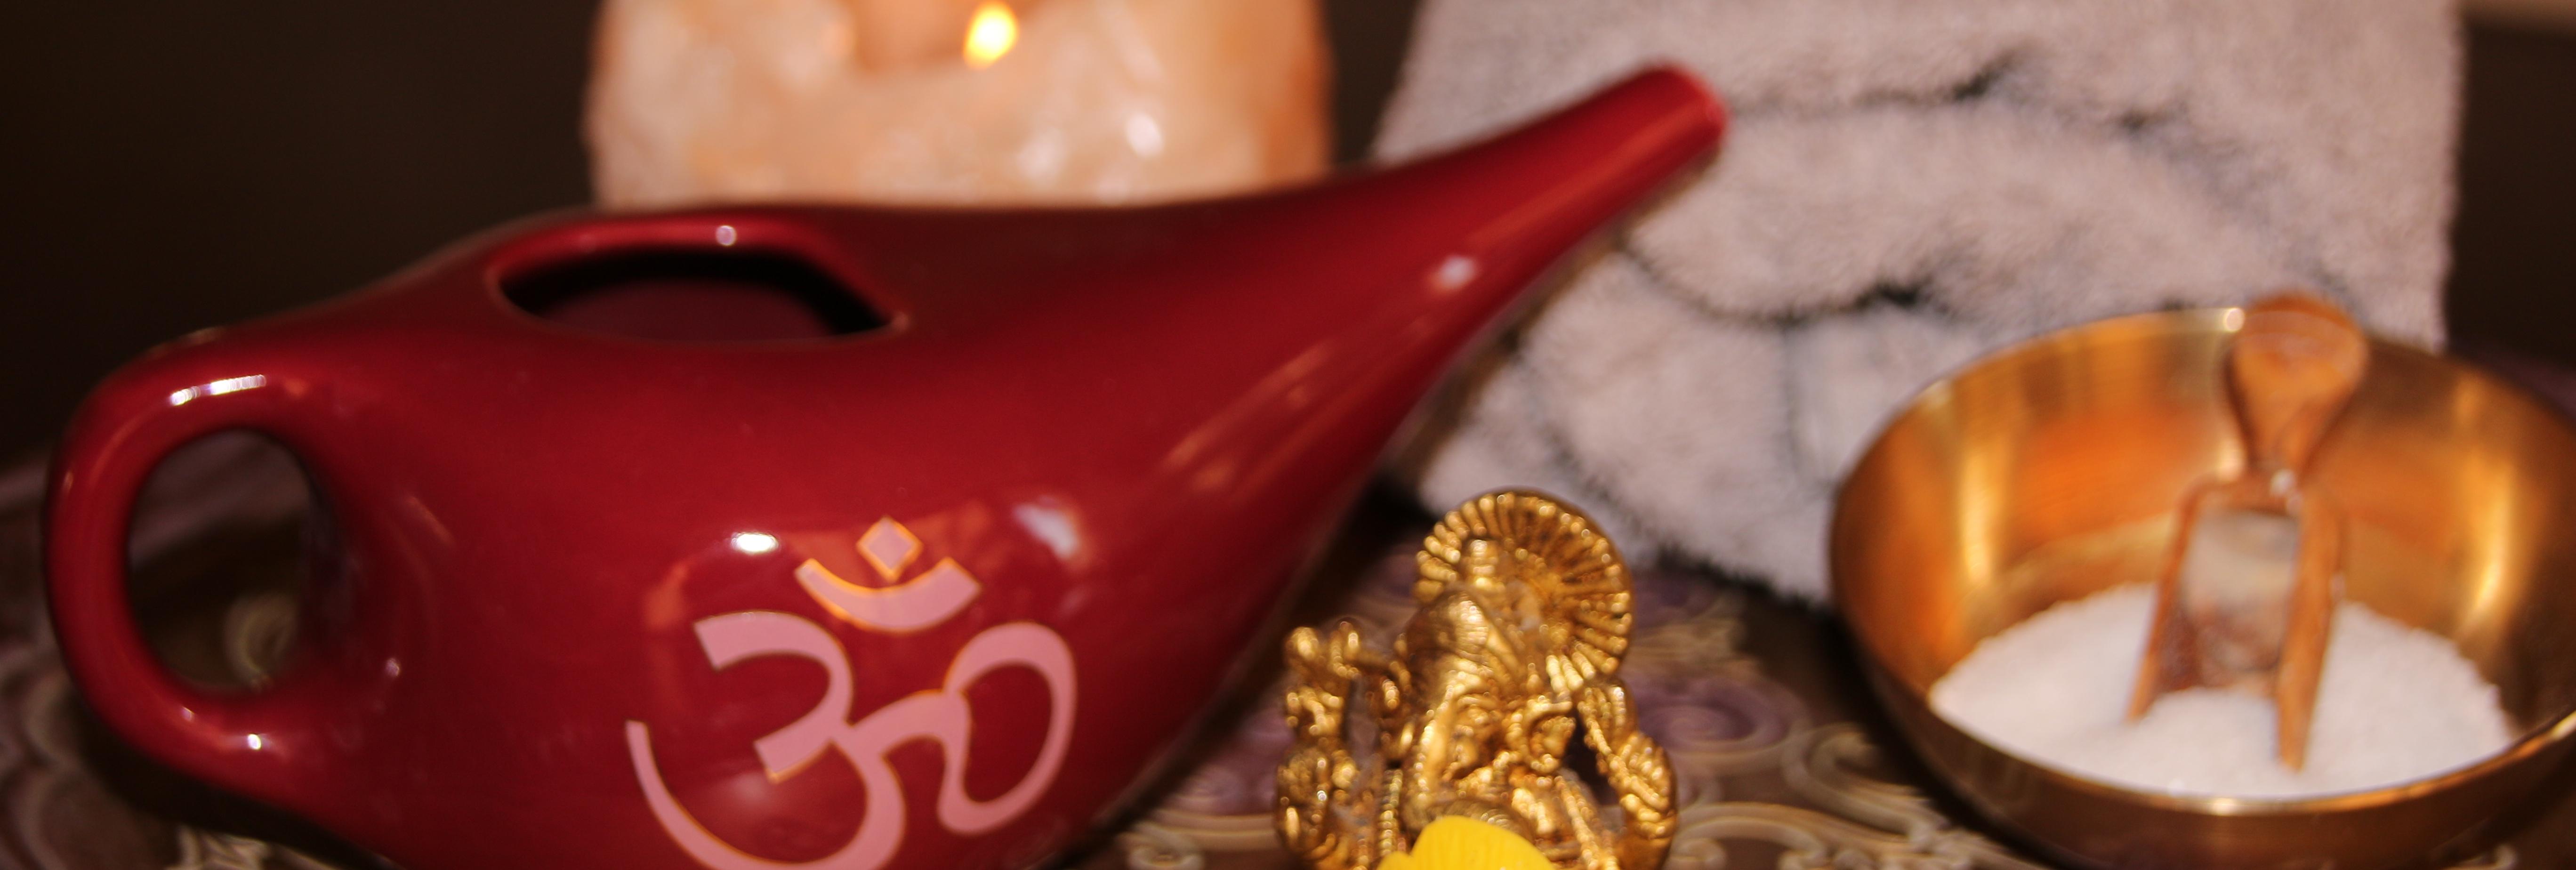 28-tägige klassische Pancakarma Kur in Nepal